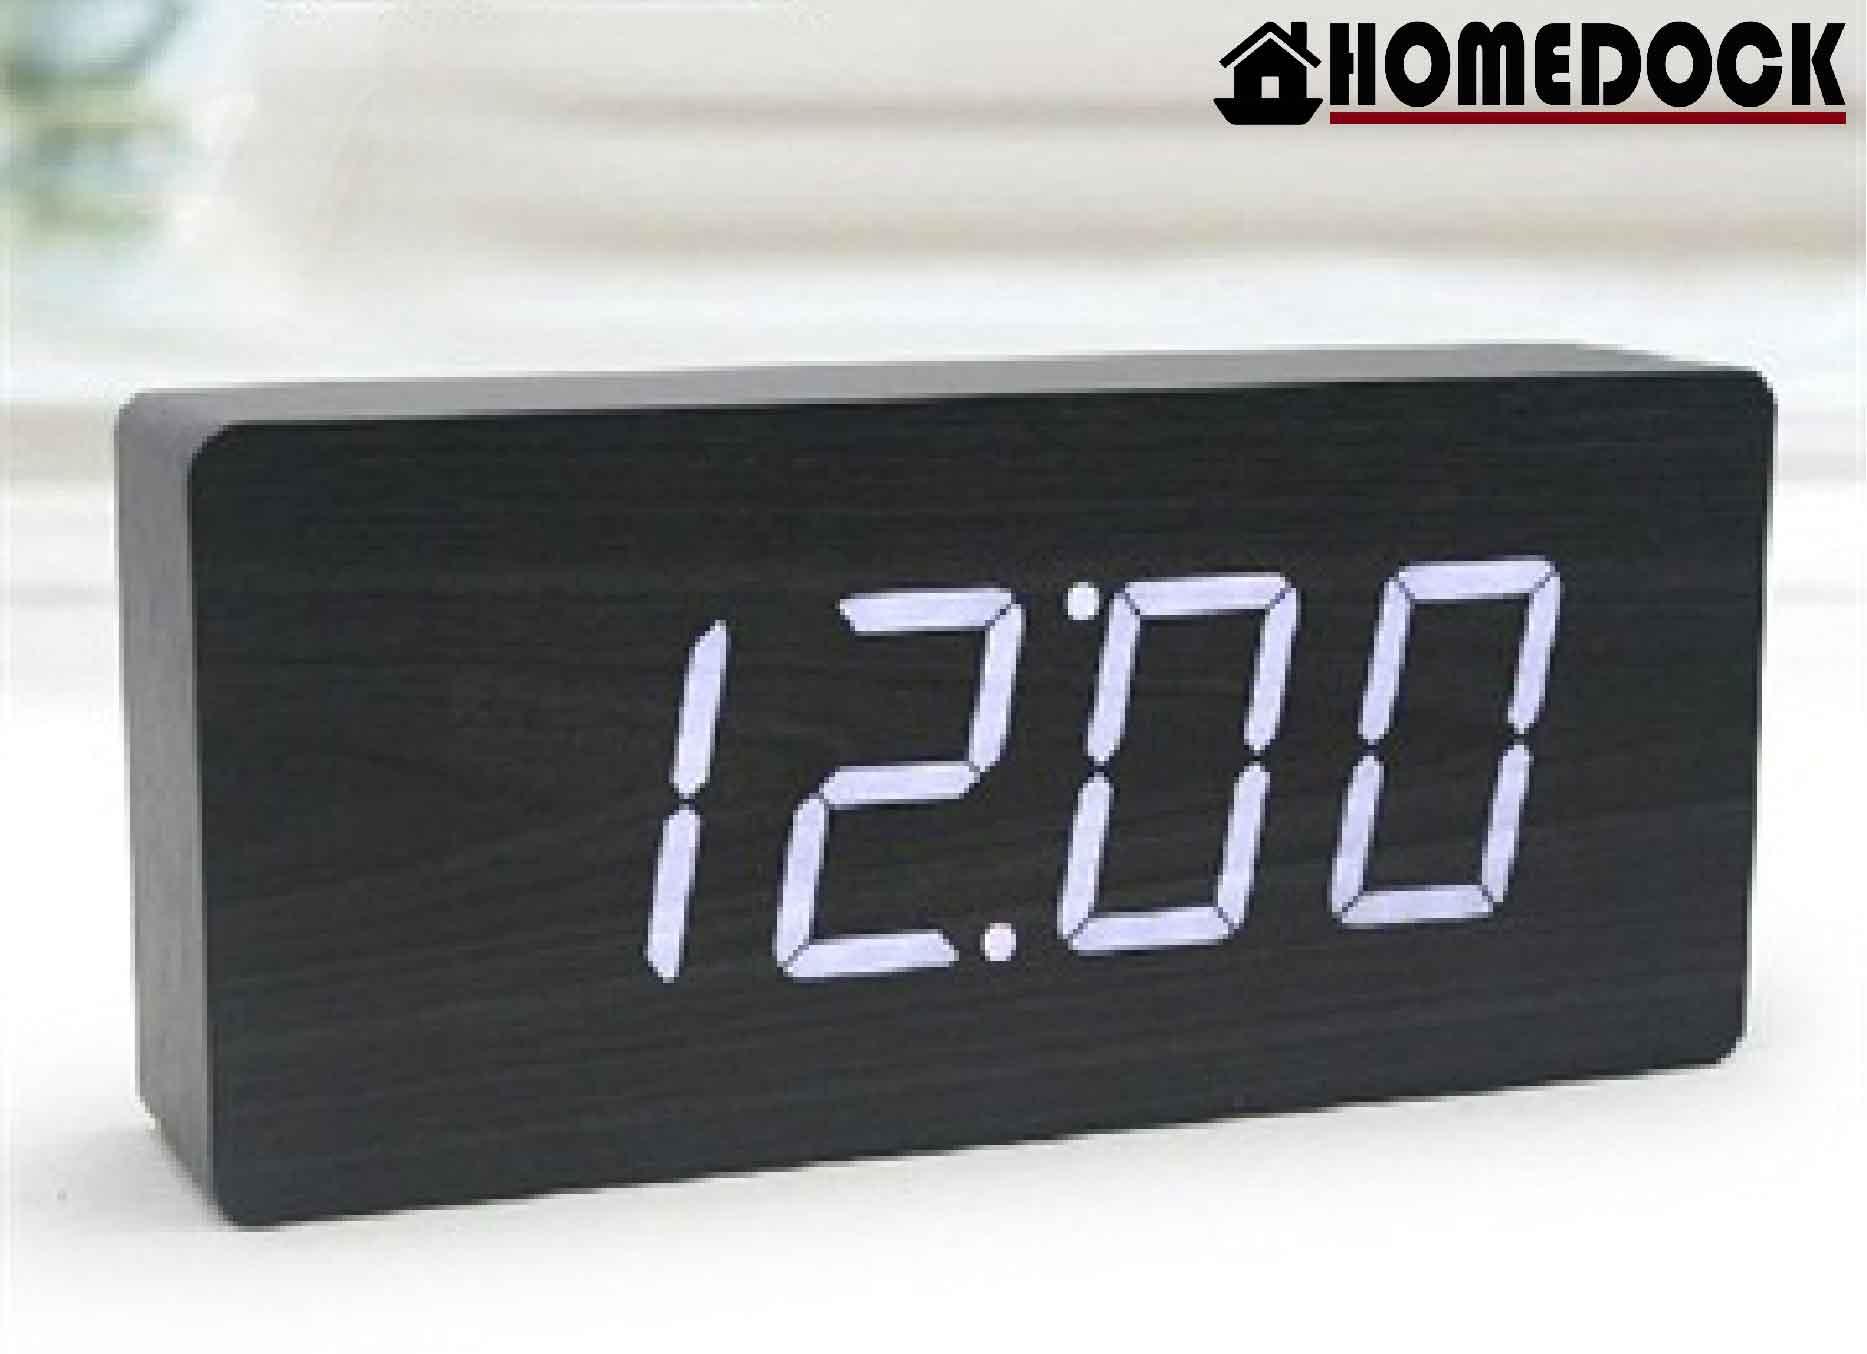 HOMEDOCK-LED 原木質感電子鬧鐘-L款  附溫度計時鐘/錶/桌鐘/電子鐘/LED木頭鐘/